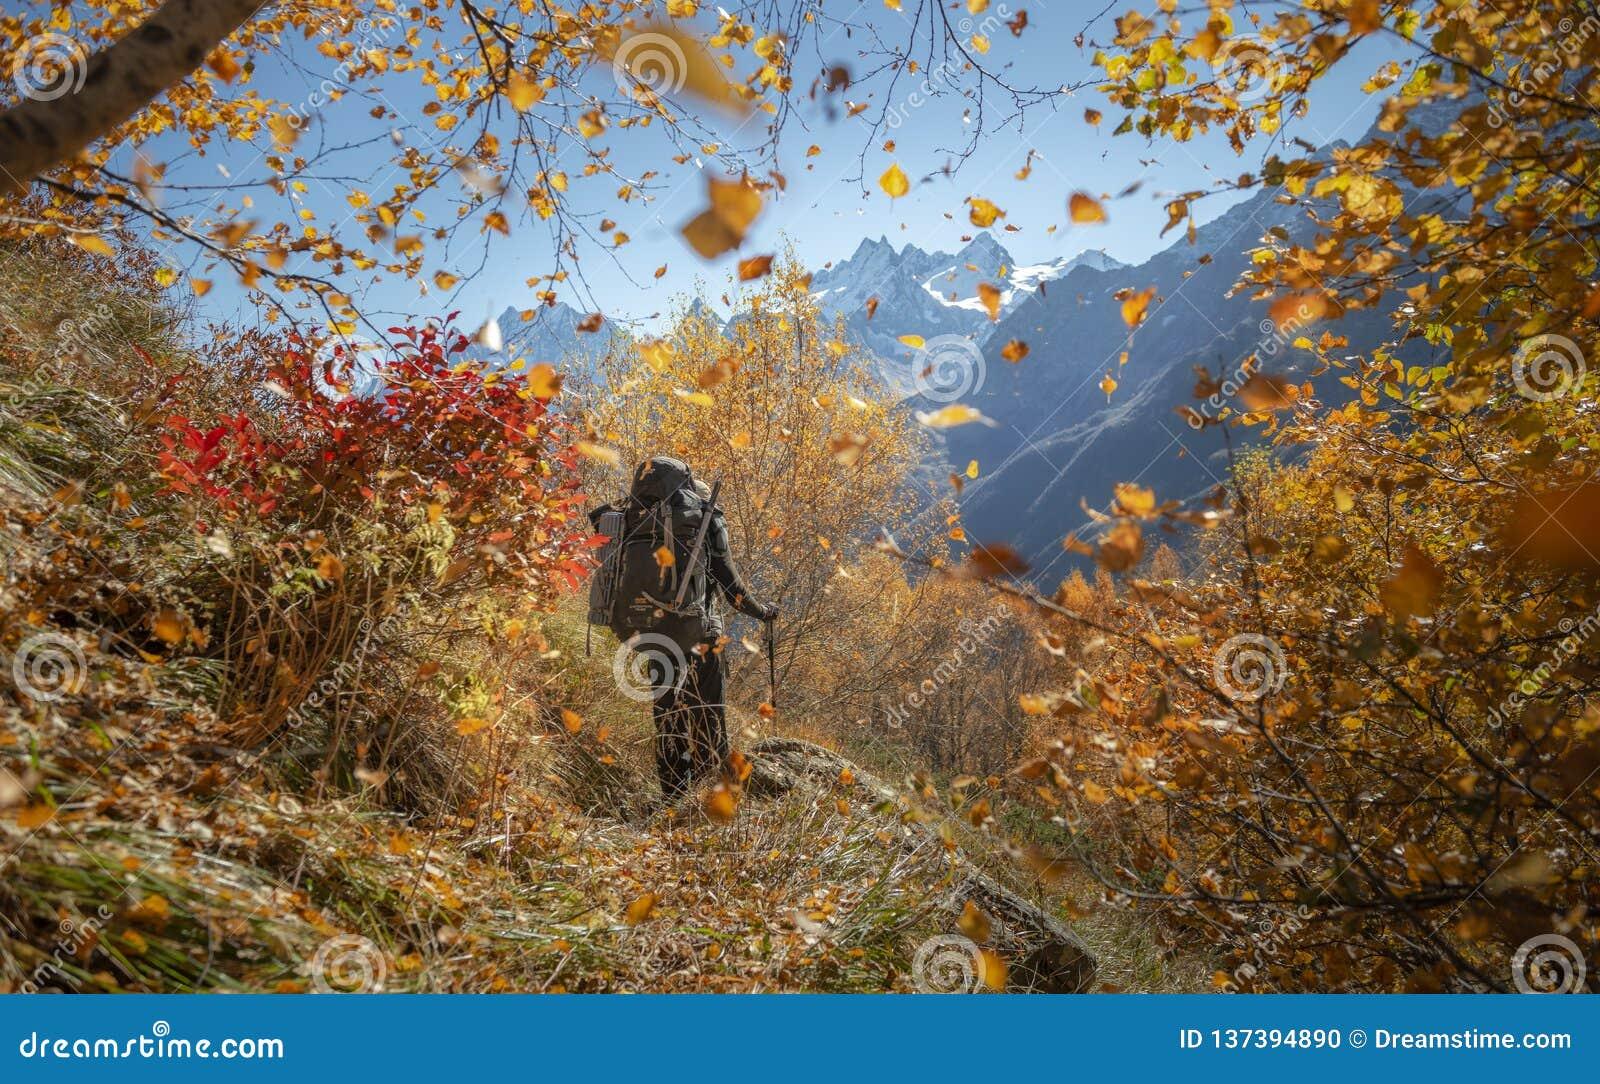 Góry, podróż, natura, jeziora, piękny miejsce